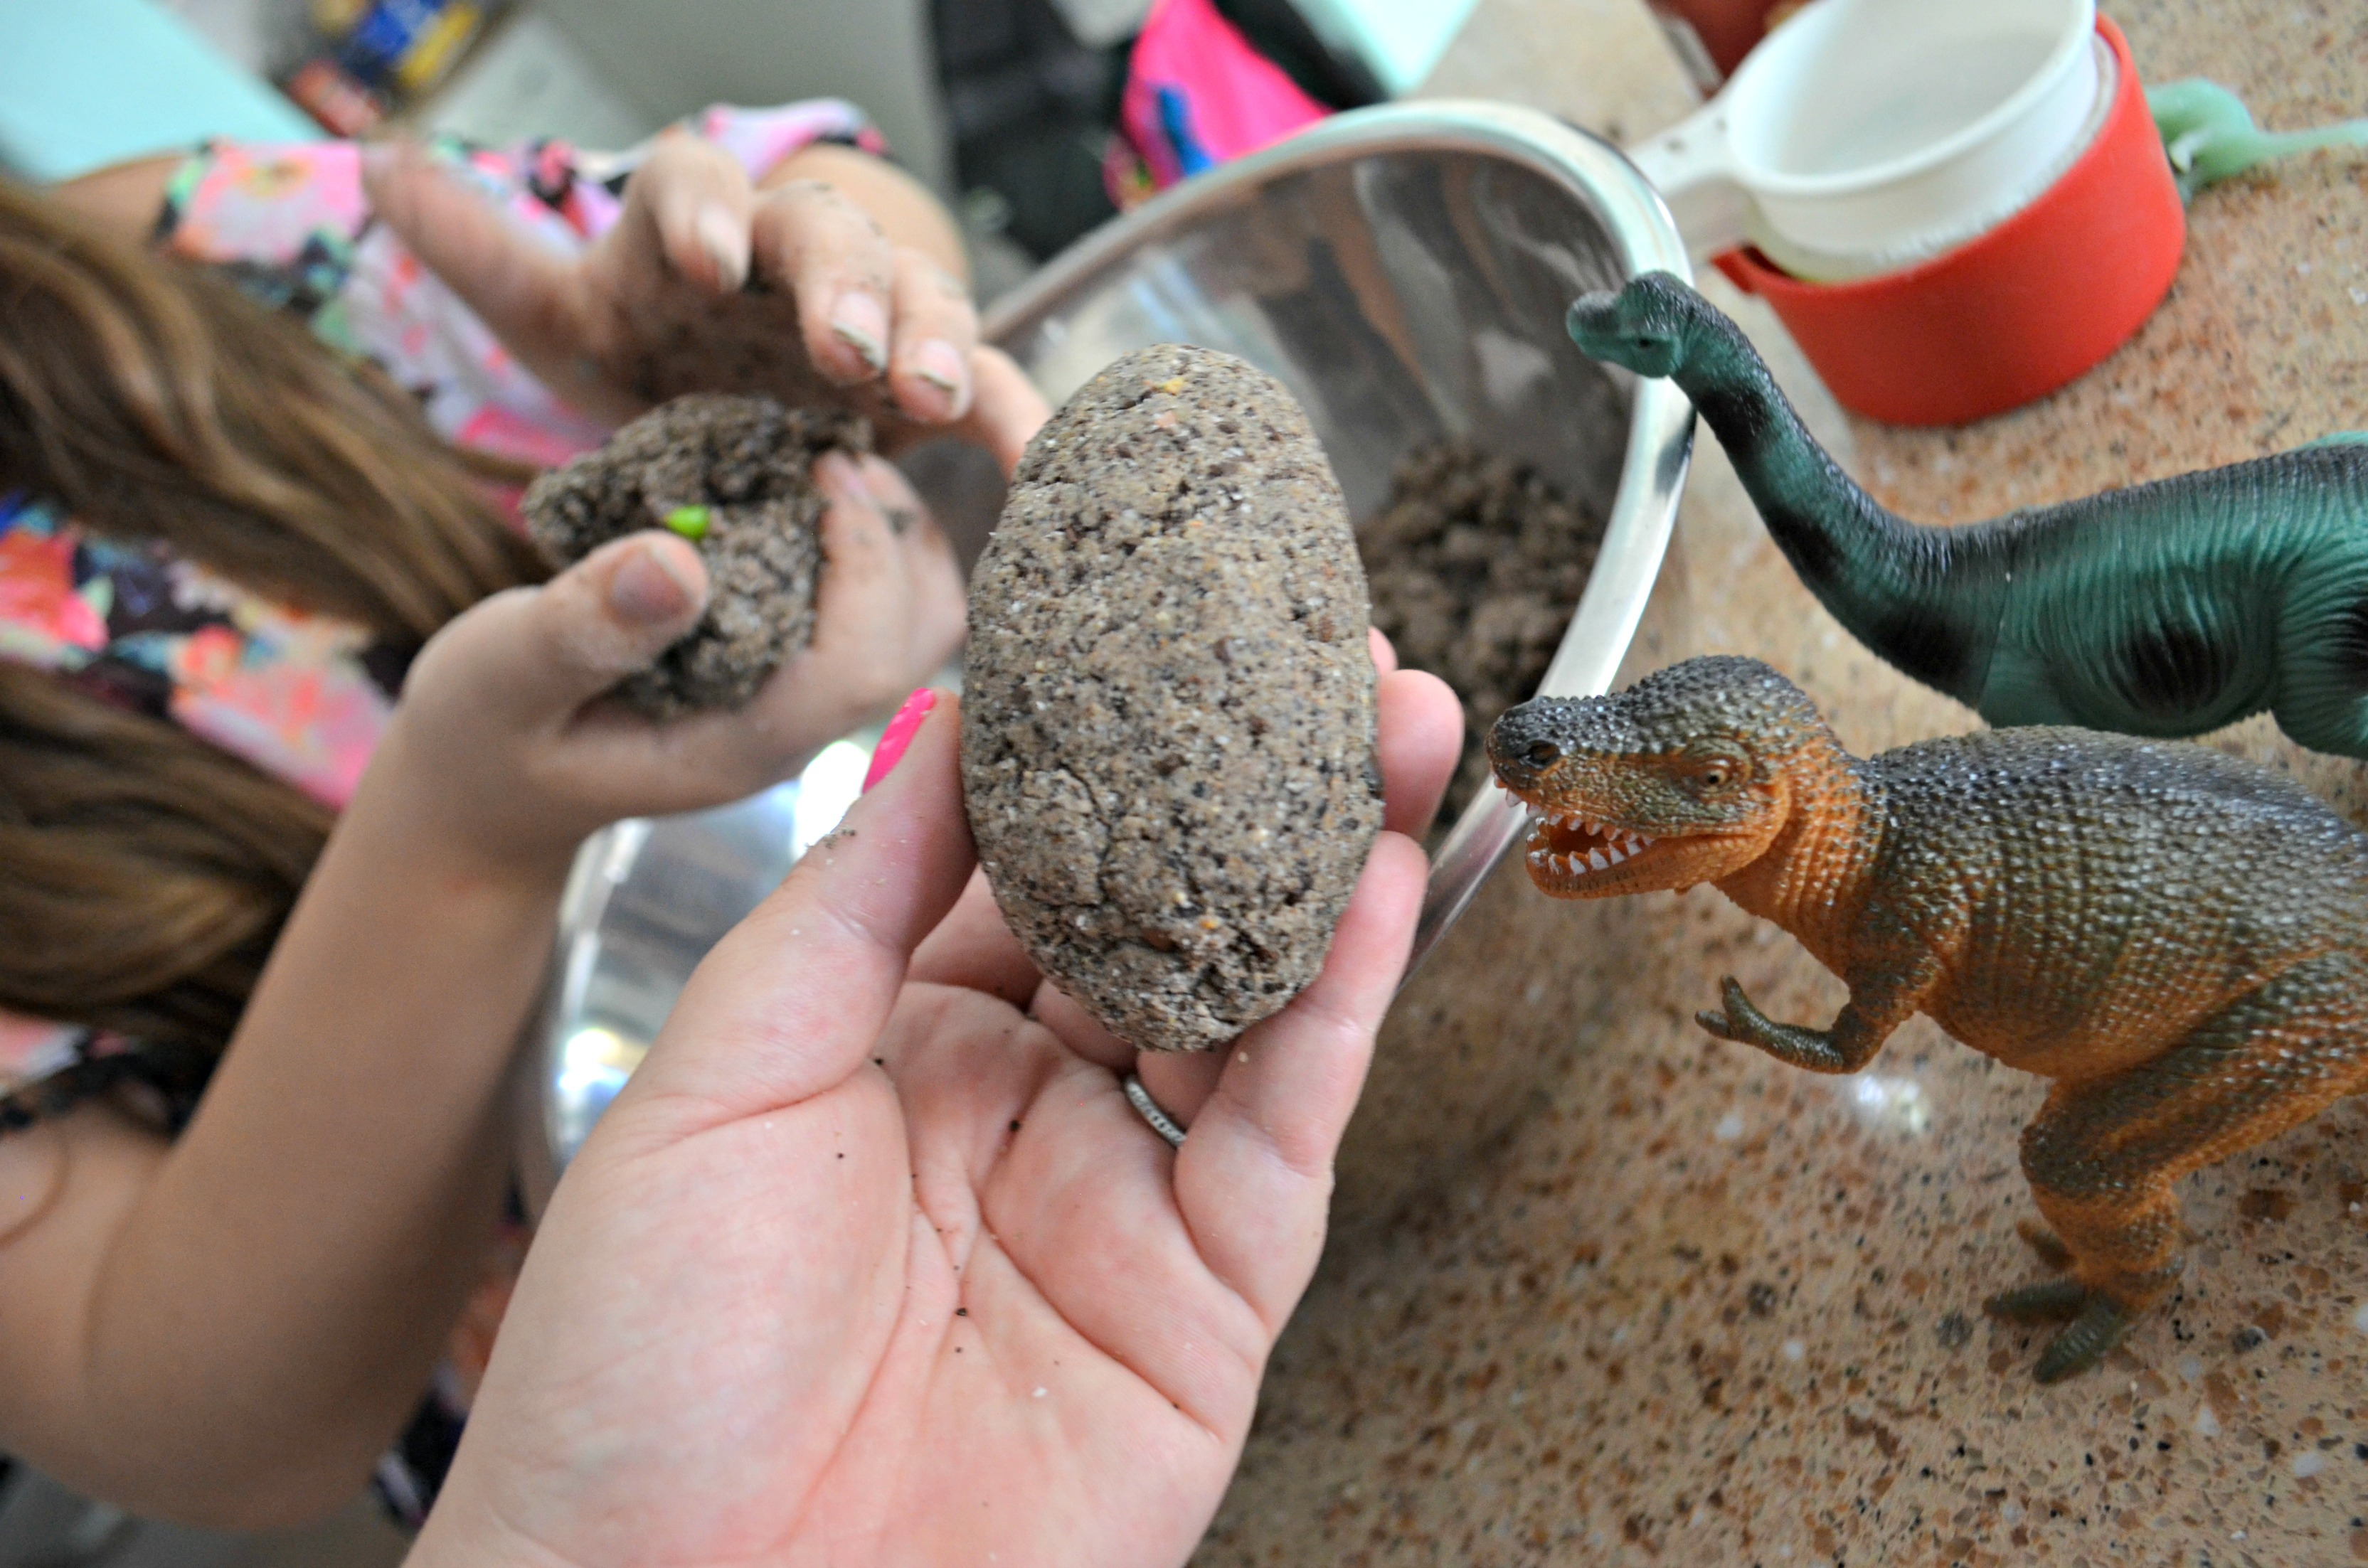 diy dinosaur surprise eggs – Forming the eggs